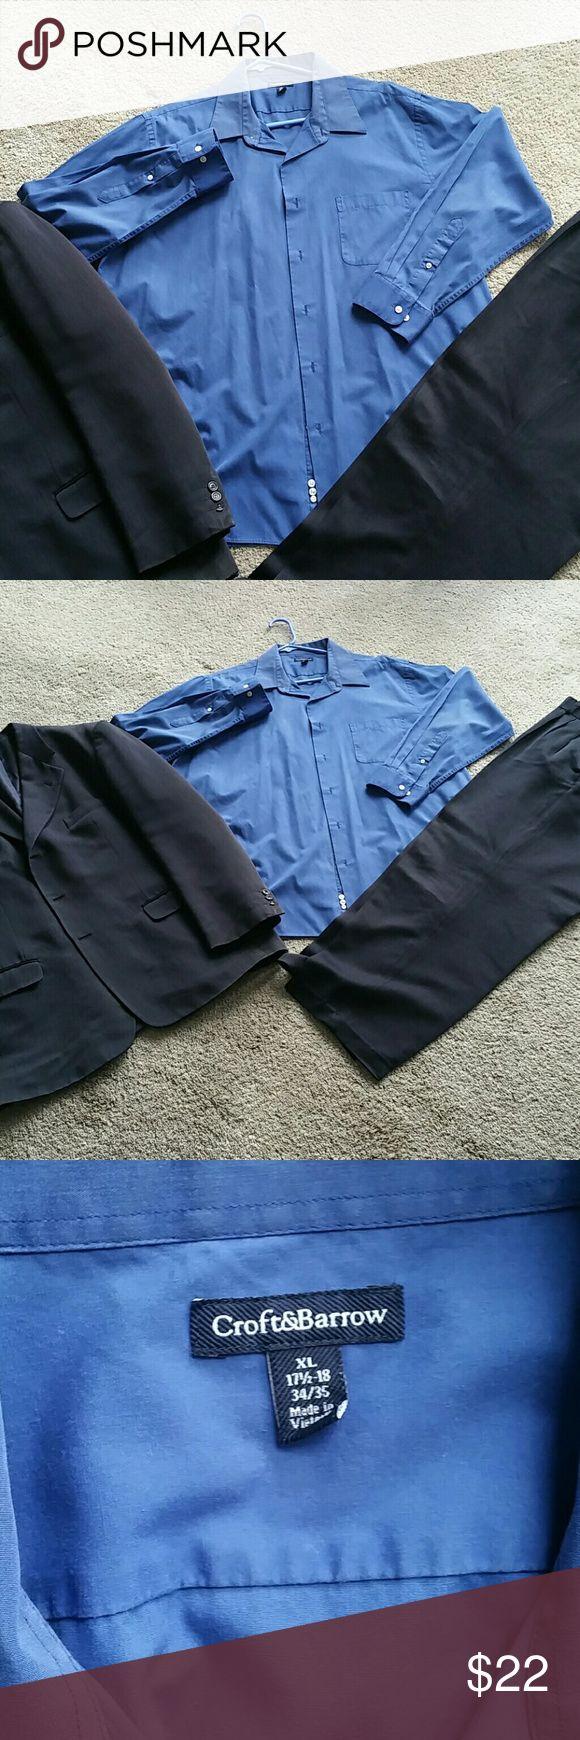 Men's Royal Blue Dress Shirt Croft & Barrow Bundle 3+ items and $ave! croft & barrow Shirts Dress Shirts